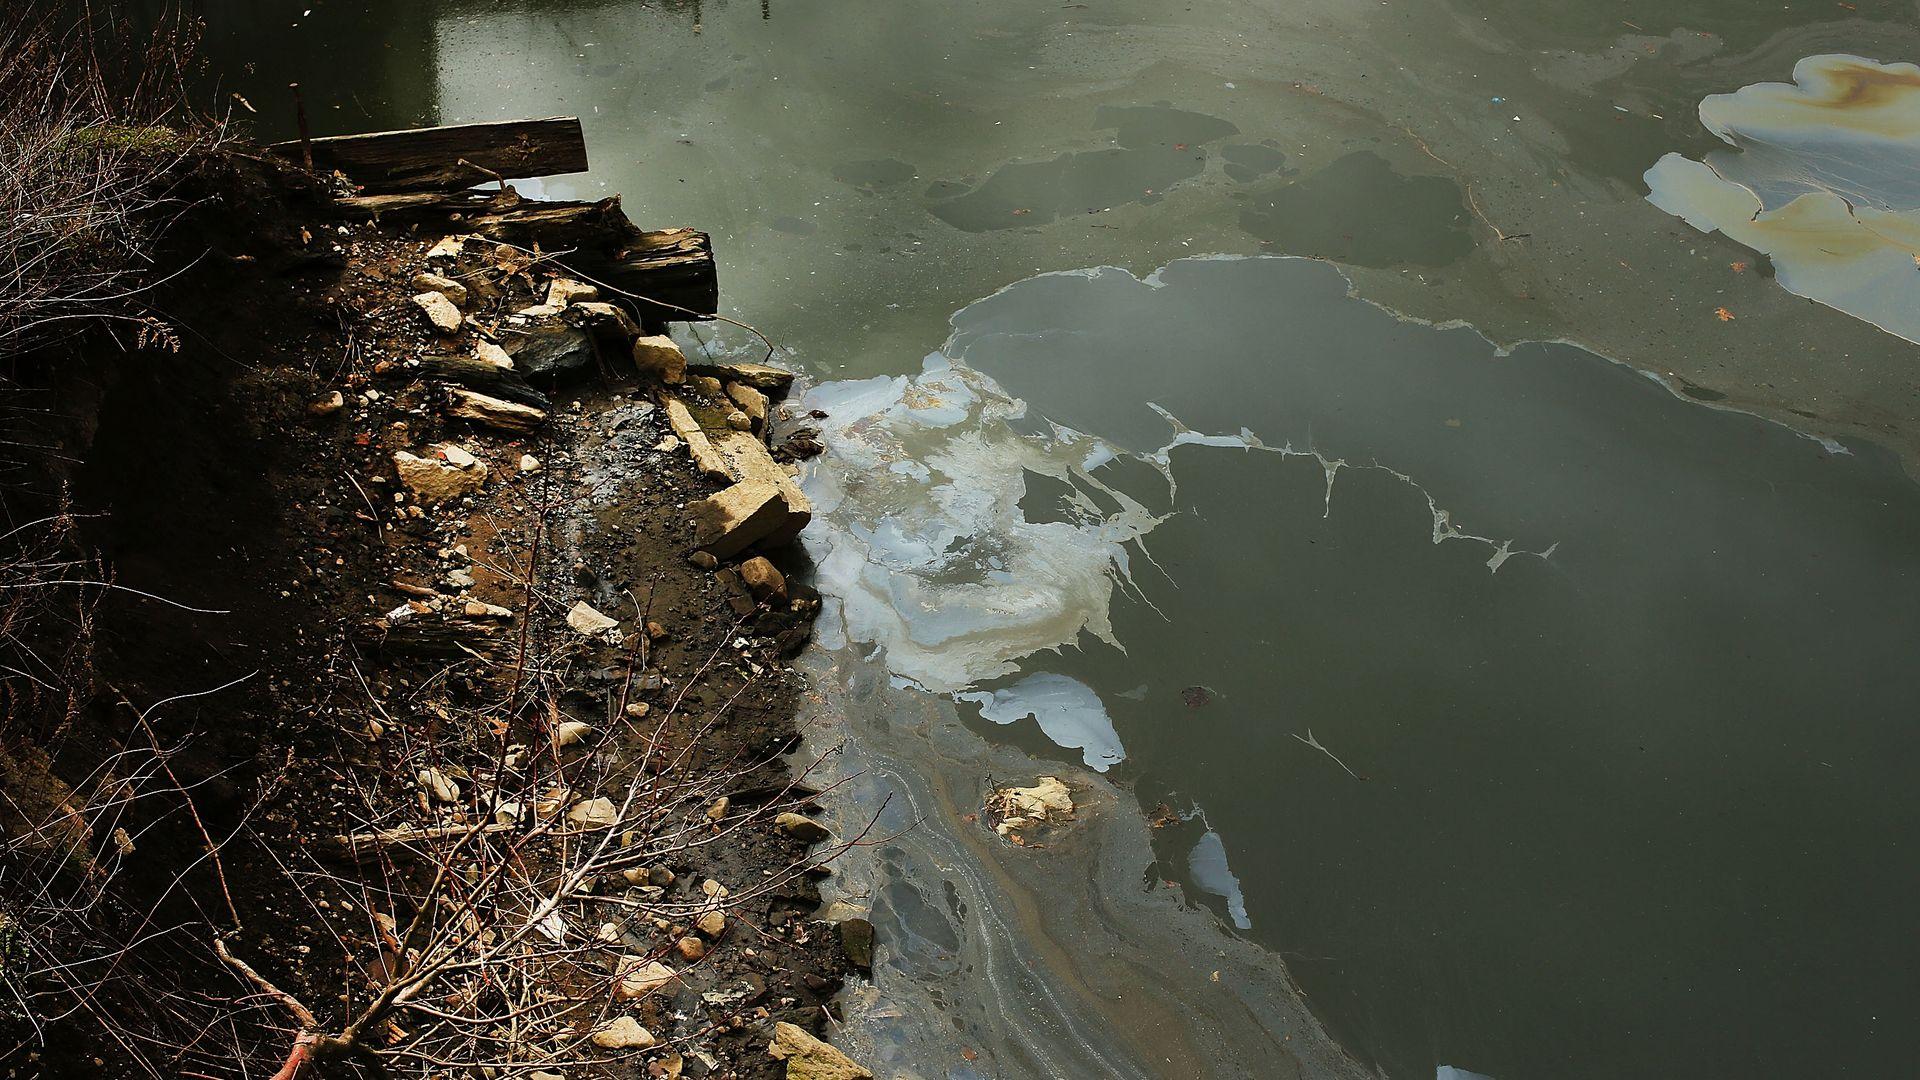 The Gowanus Canal, a designated federal Superfund site in Brooklyn, New York.